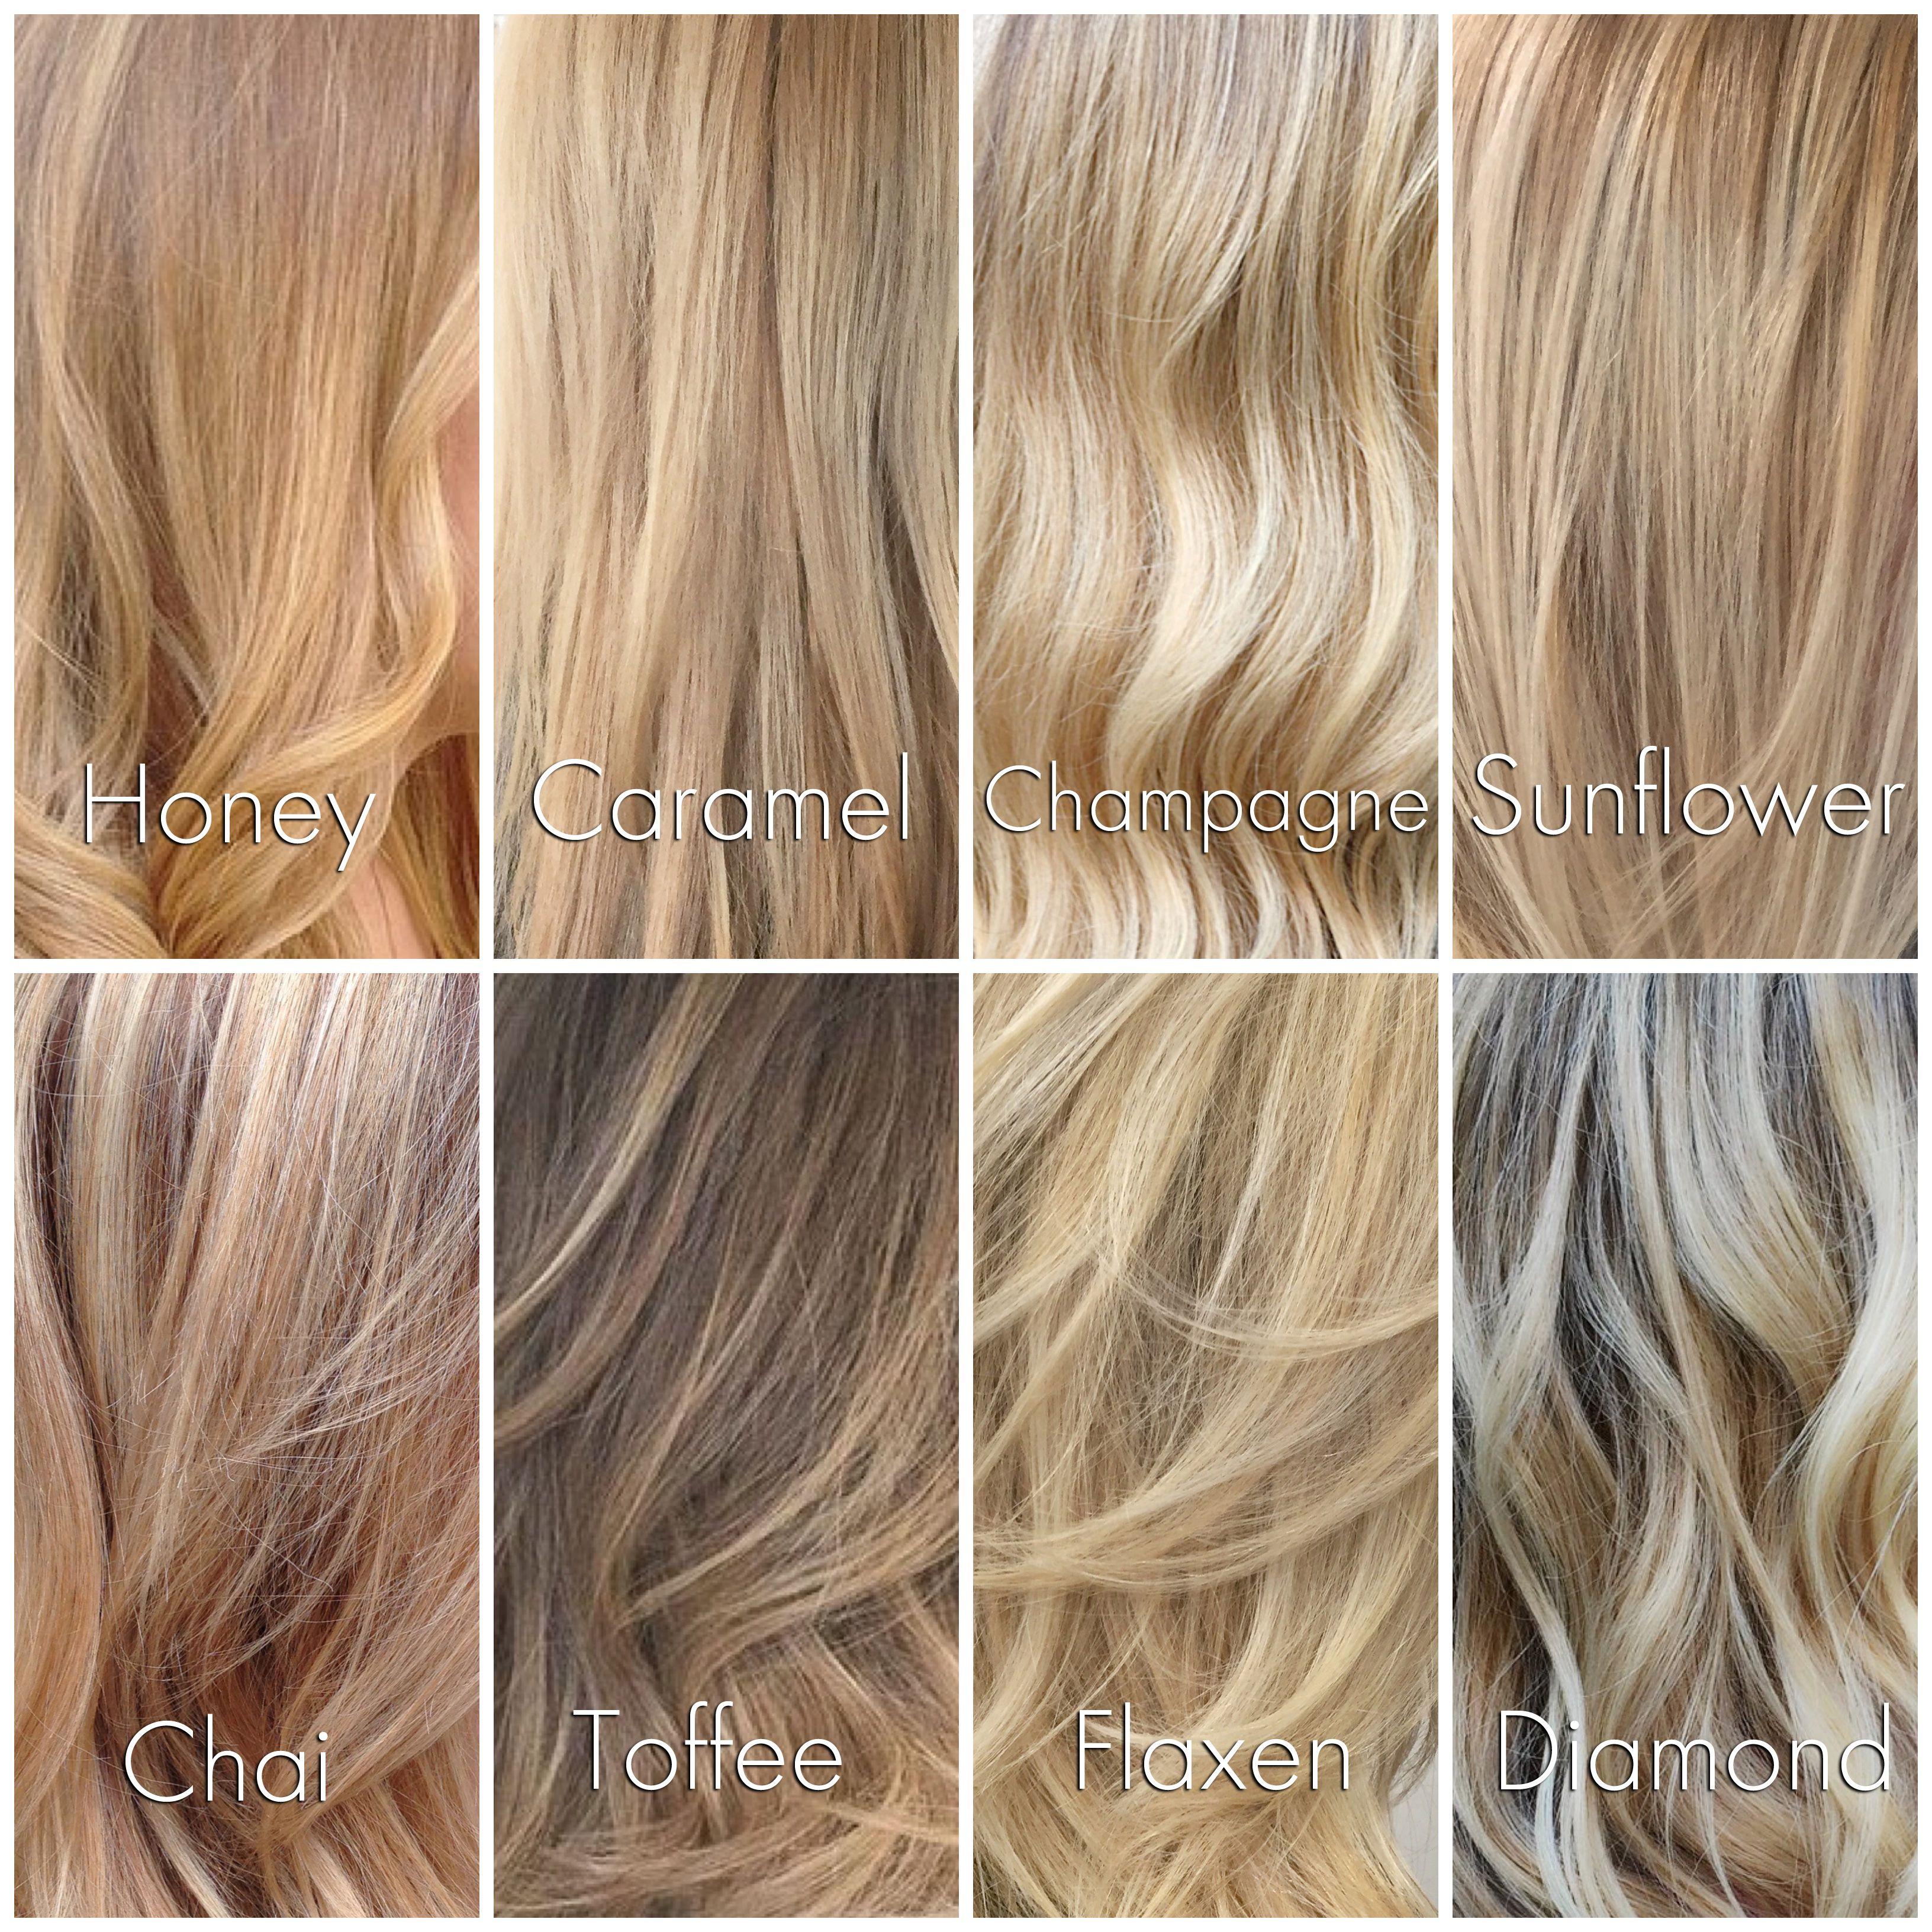 Pin By Merci Kastelyos On Hajak Blonde Hair Color Chart Hair Color Chart Blonde Hair Shades